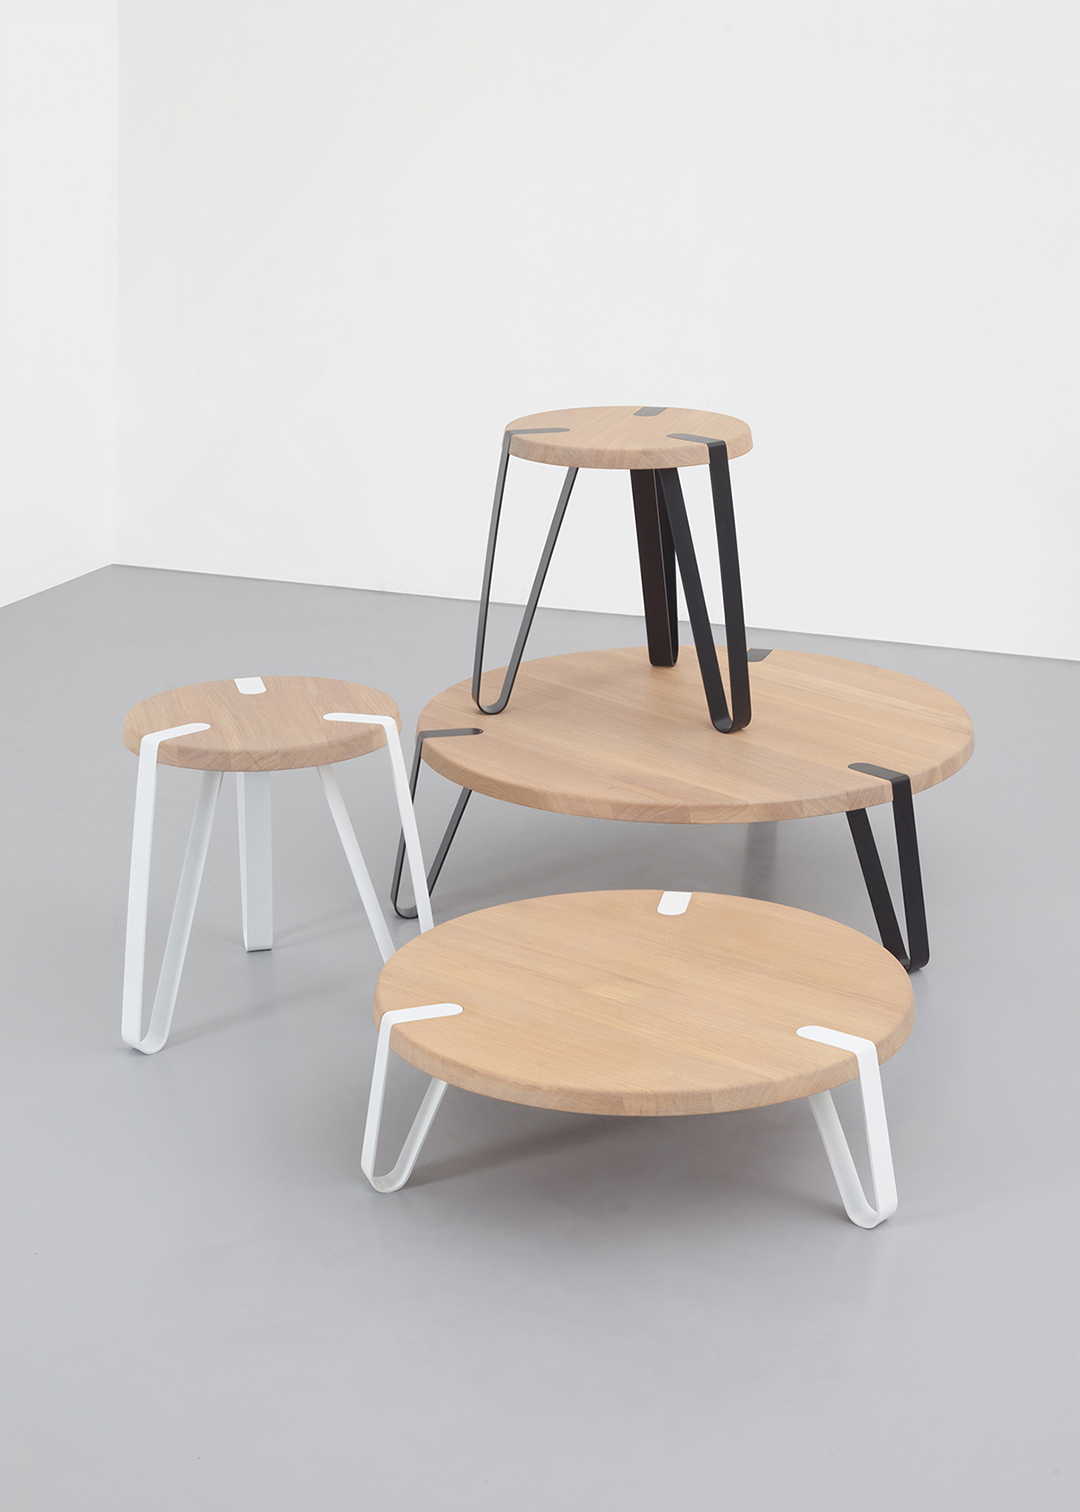 Salontafel Set Rond Wit.Level Rond Design Salontafel L Erik Remmers L Odesi Your Dutch Design